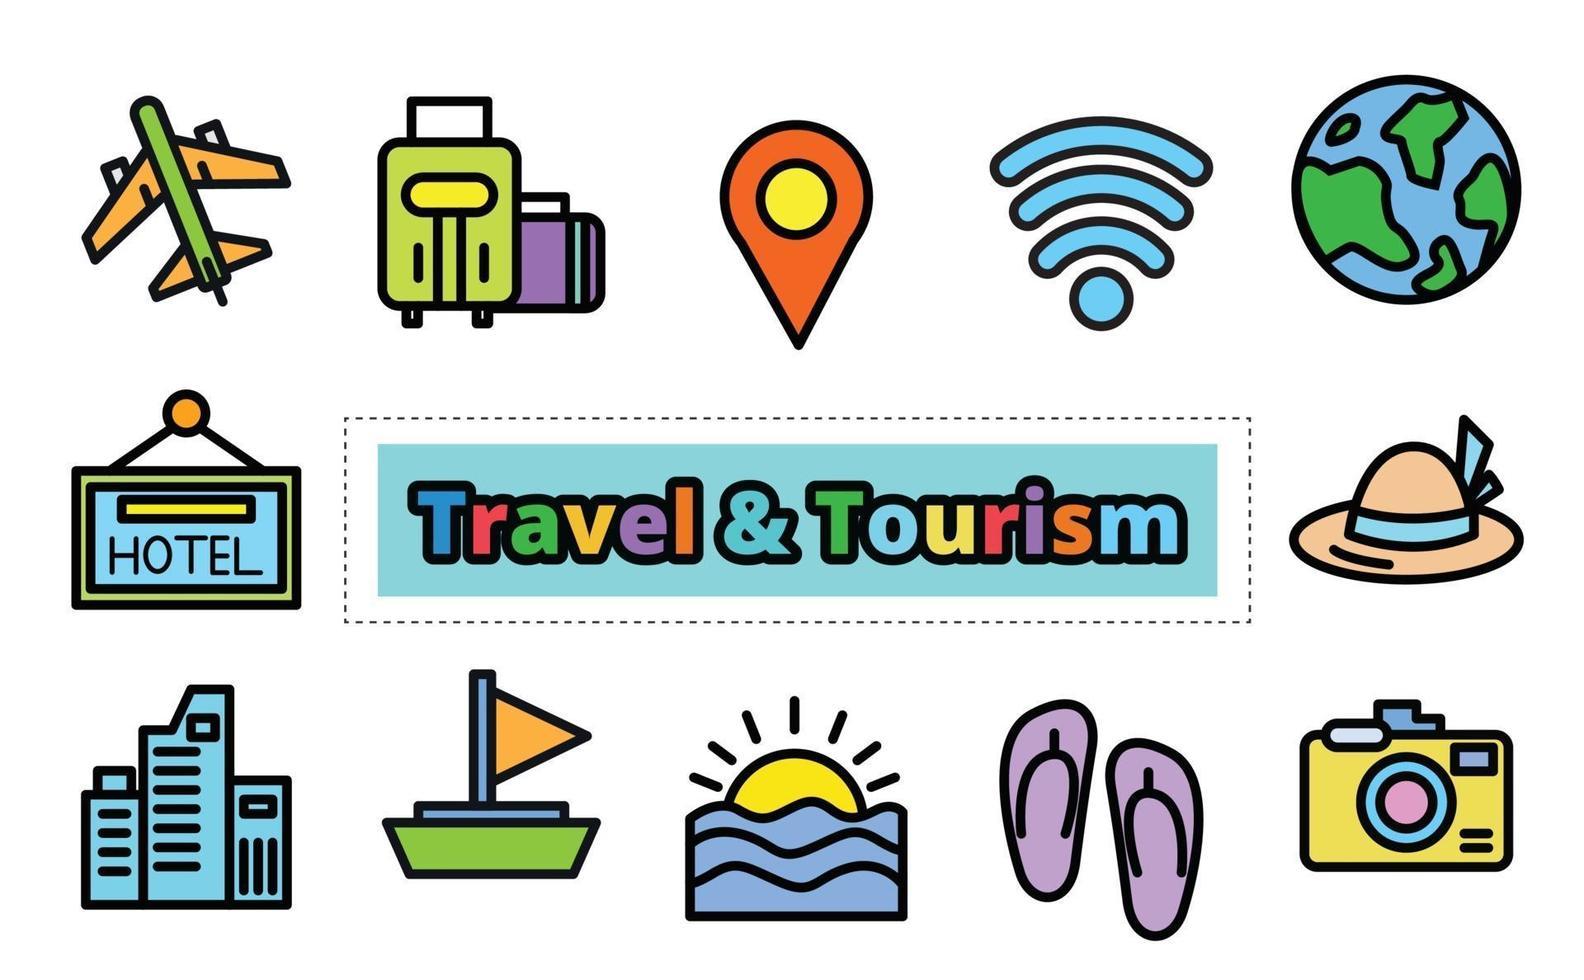 Travel  tourism icon set, vector design.